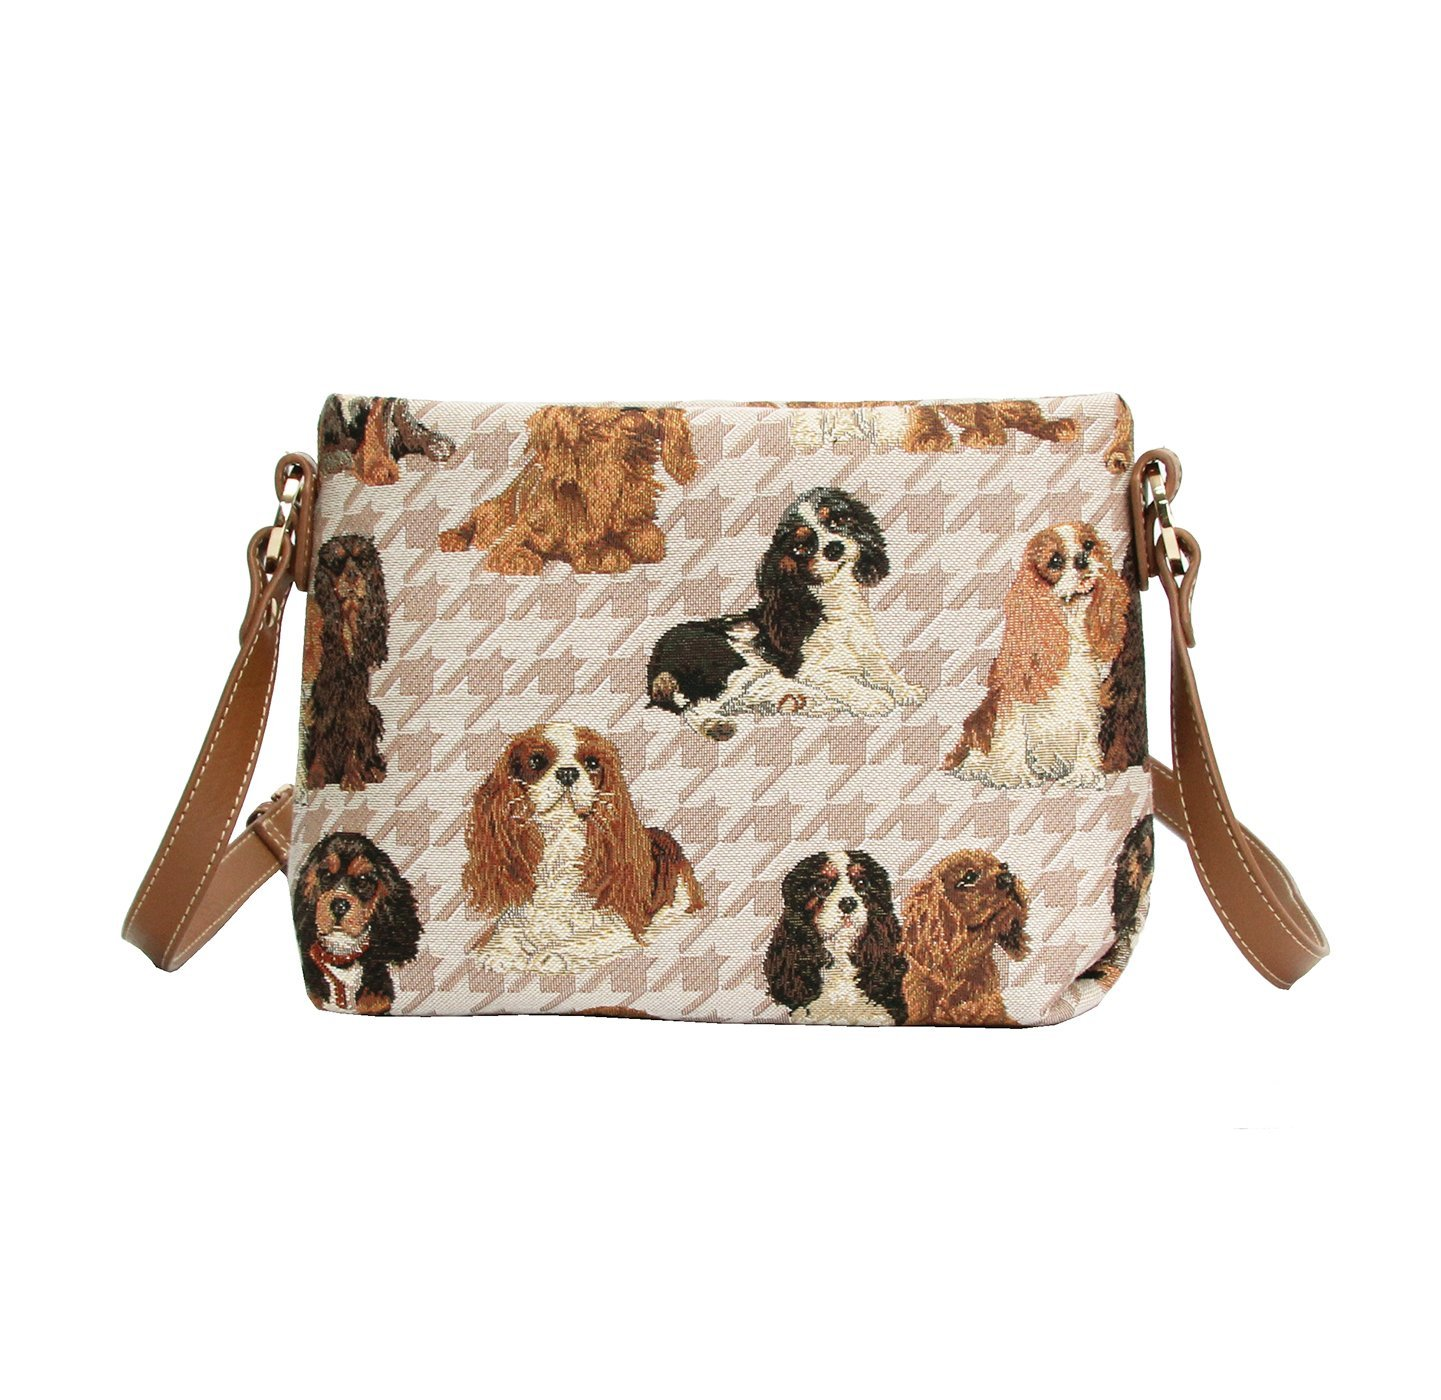 Signare Womens Tapestry Fashion Shoulder Handbag Across Body Bag in Cavalier King Charles Spaniel Dog